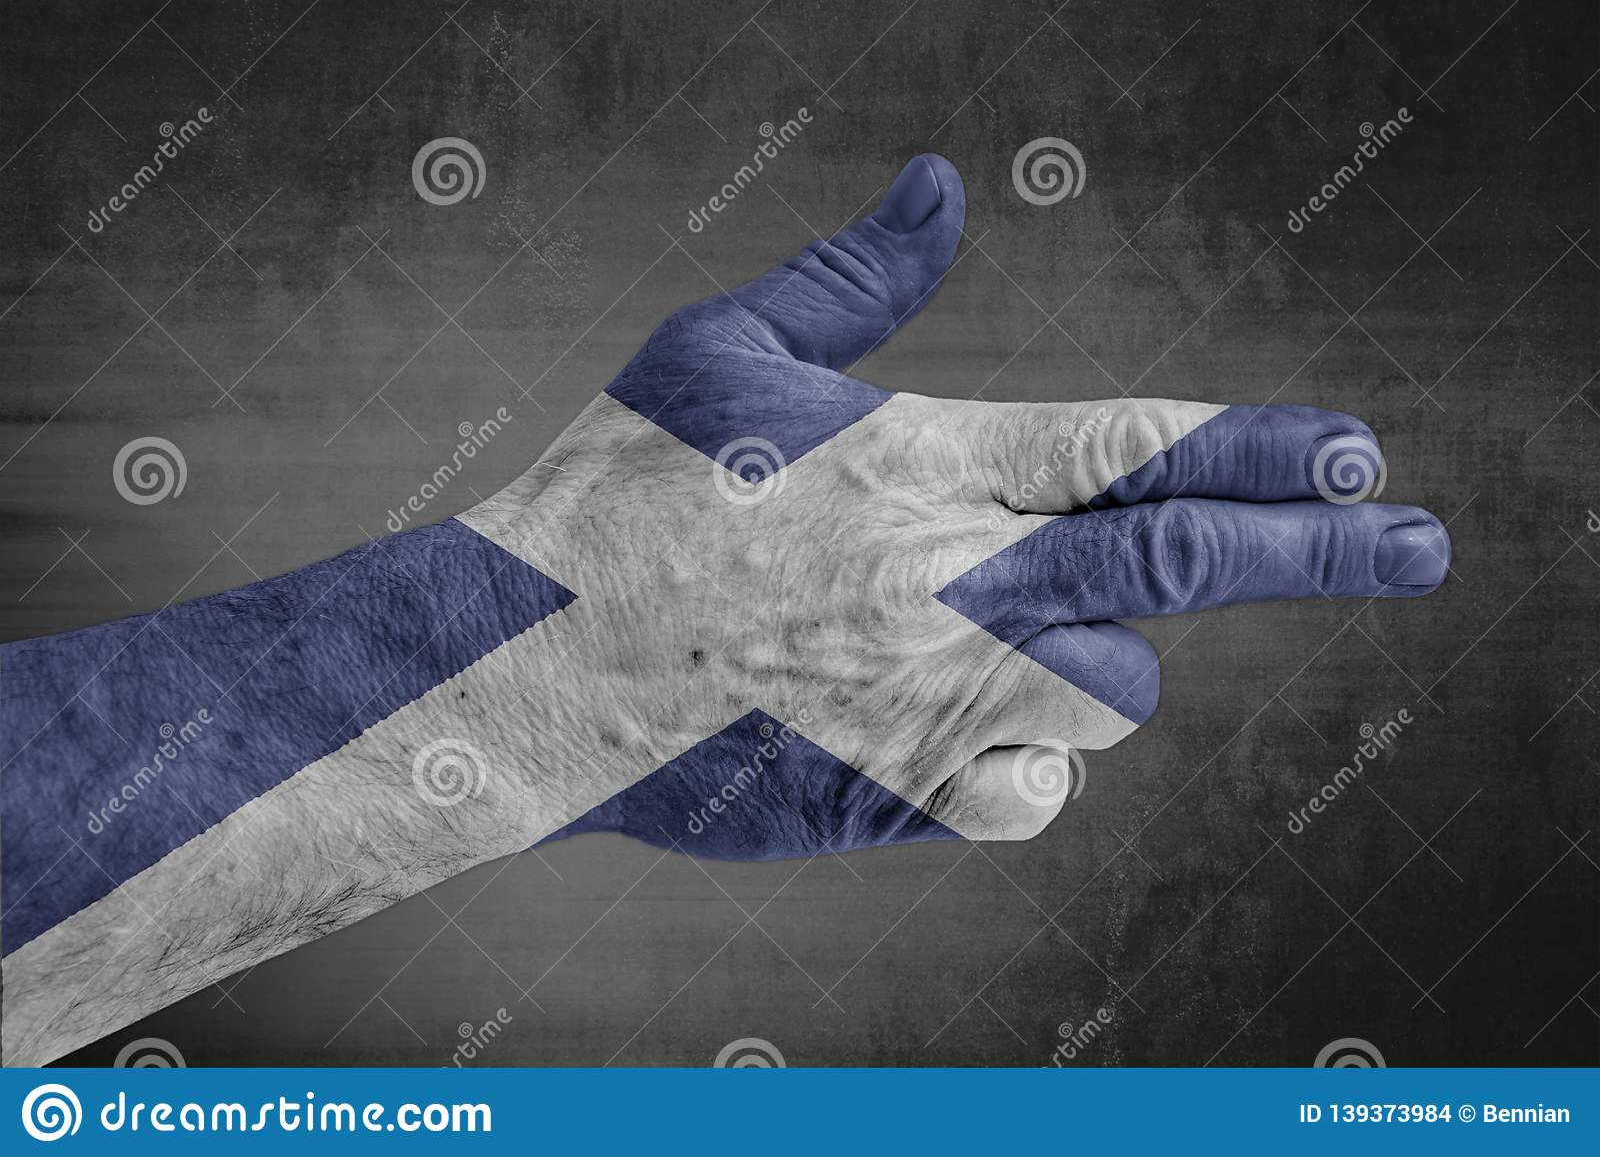 Scotland flag painted on male hand like a gun